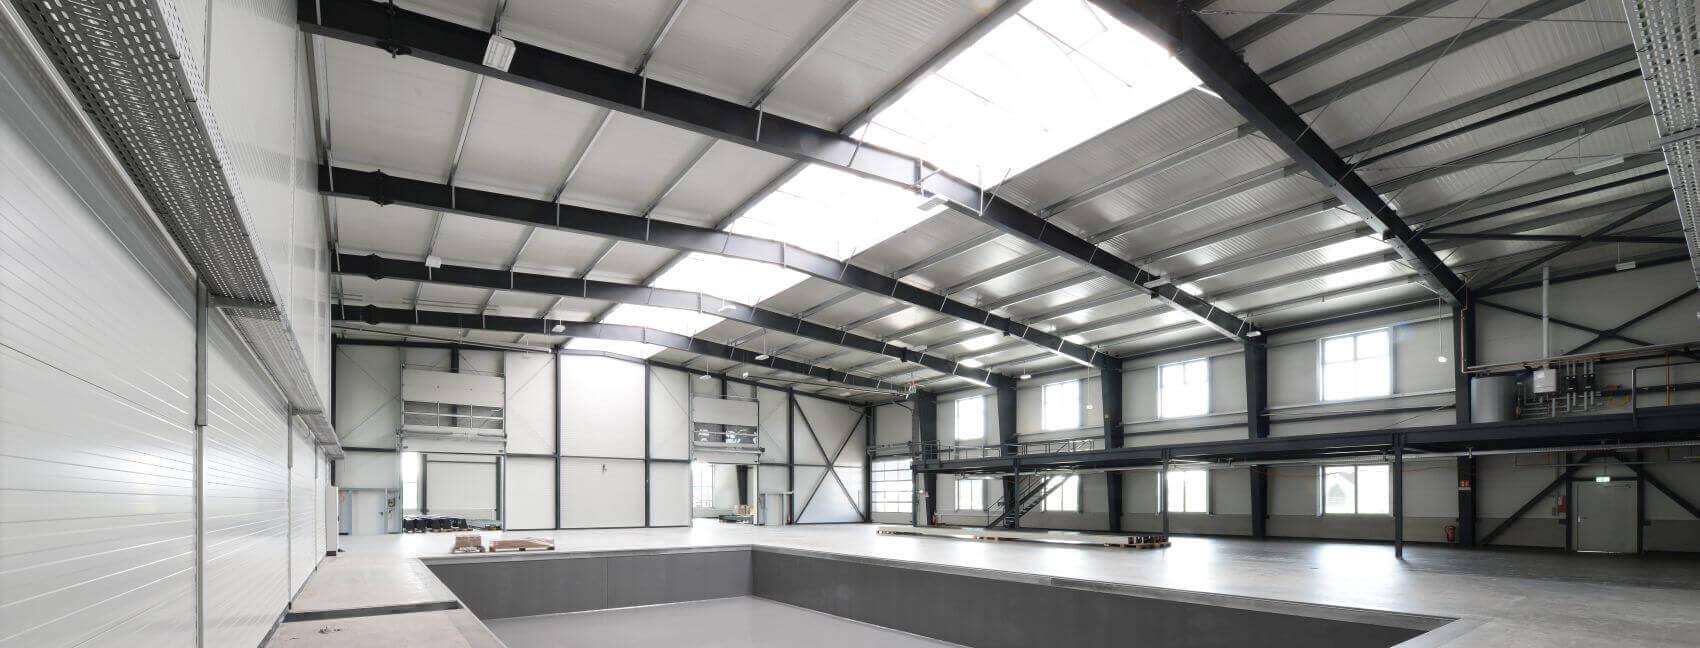 Hallenbau pem buildings stahlhallen f r industrie for 4000 sq ft steel building